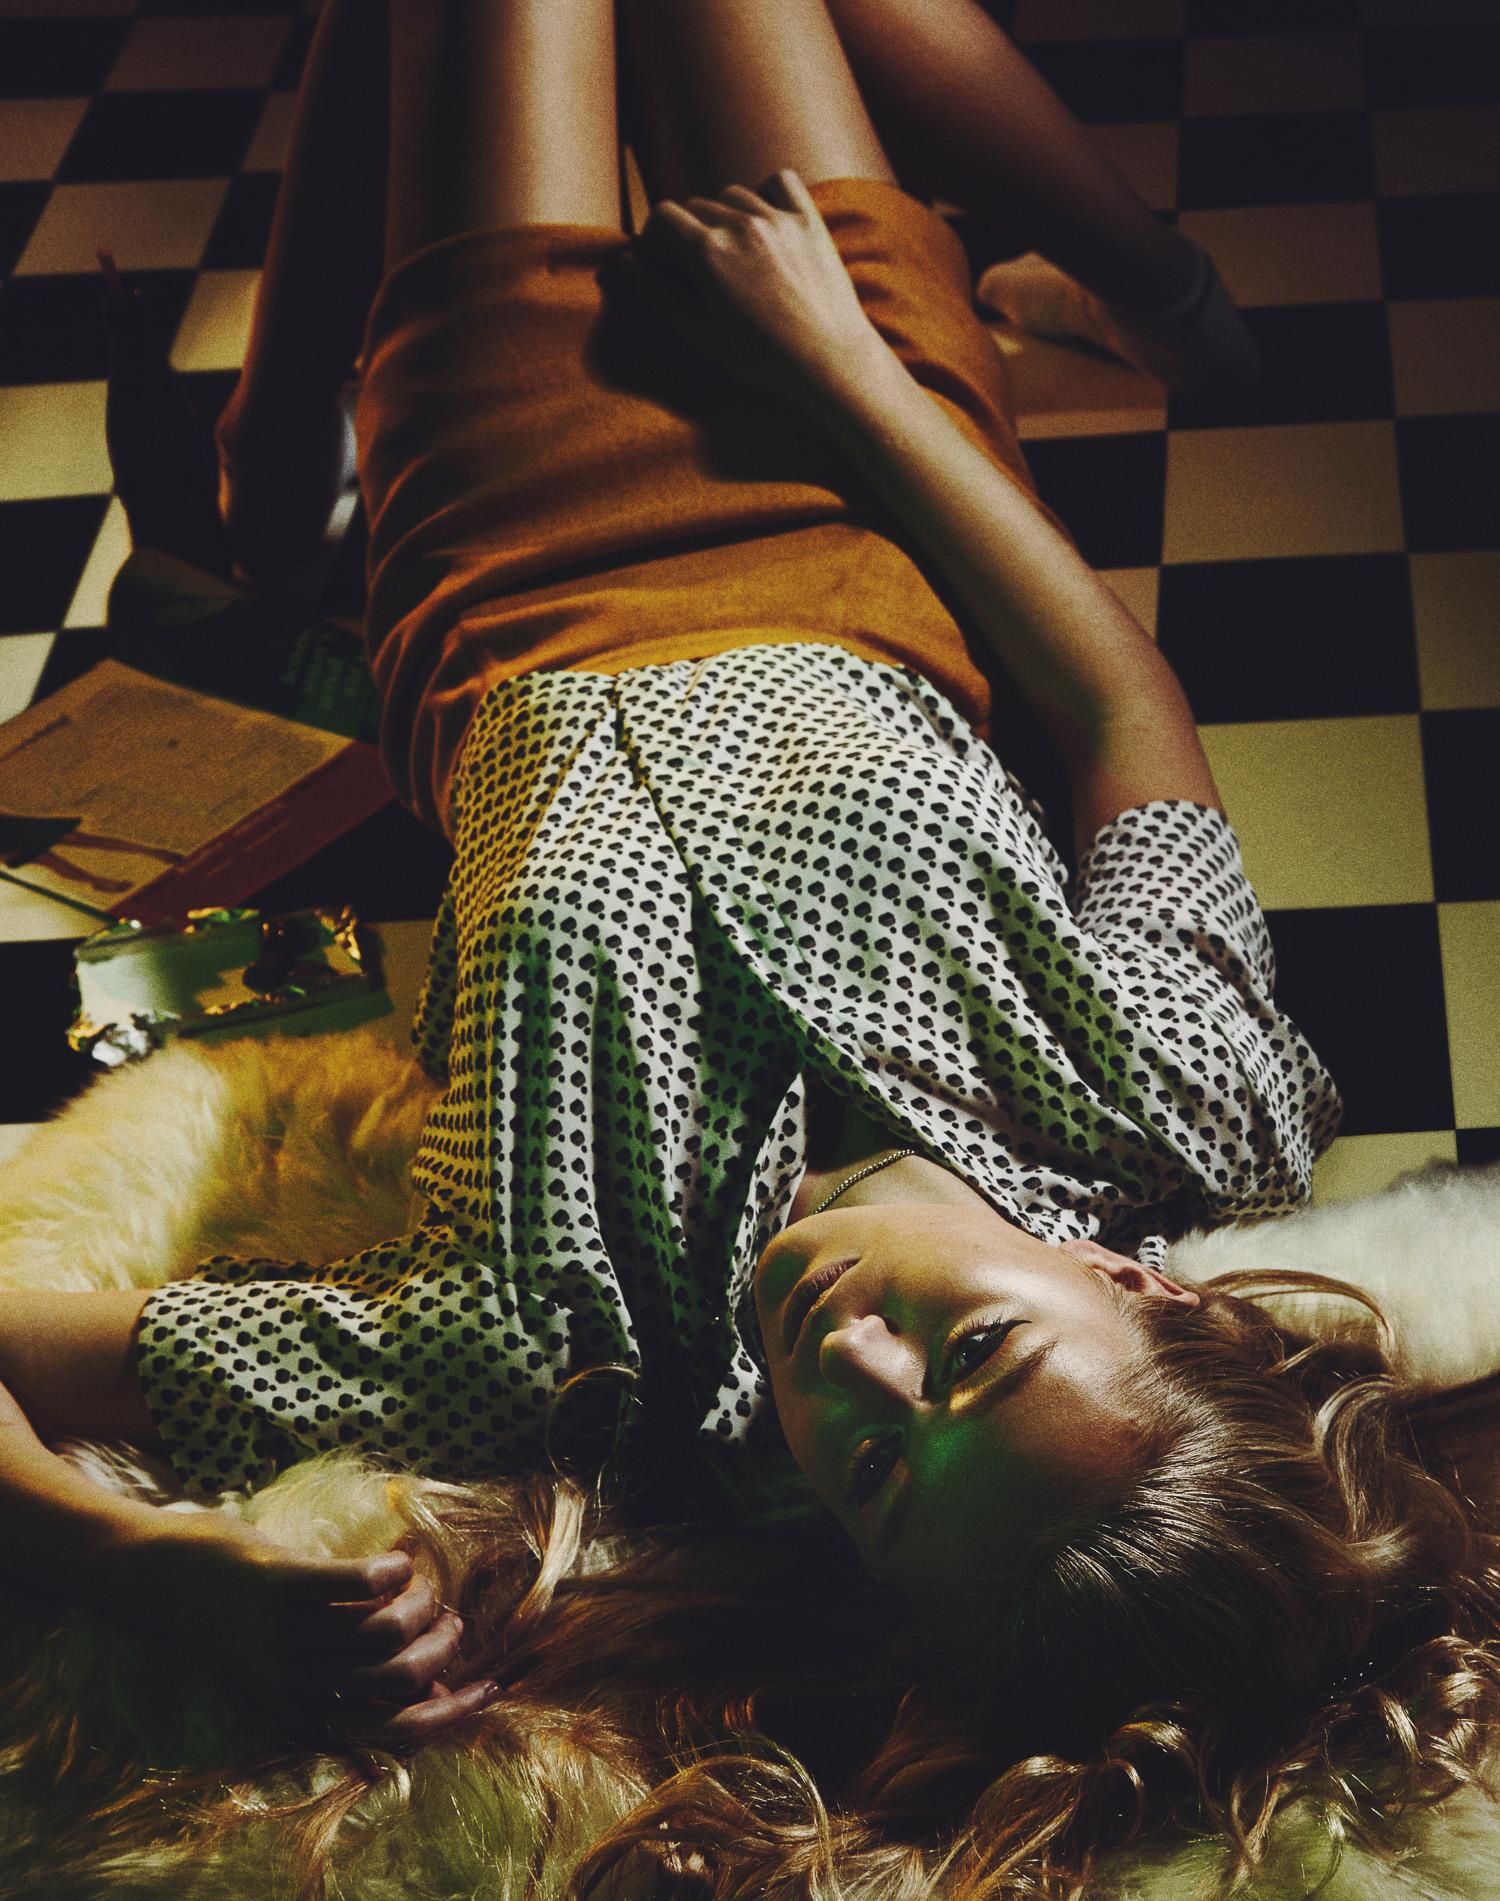 susanne-schubert-susi-cocaine-models-fashion-fotograf-bielefeld-tim-ilskens-7.jpg